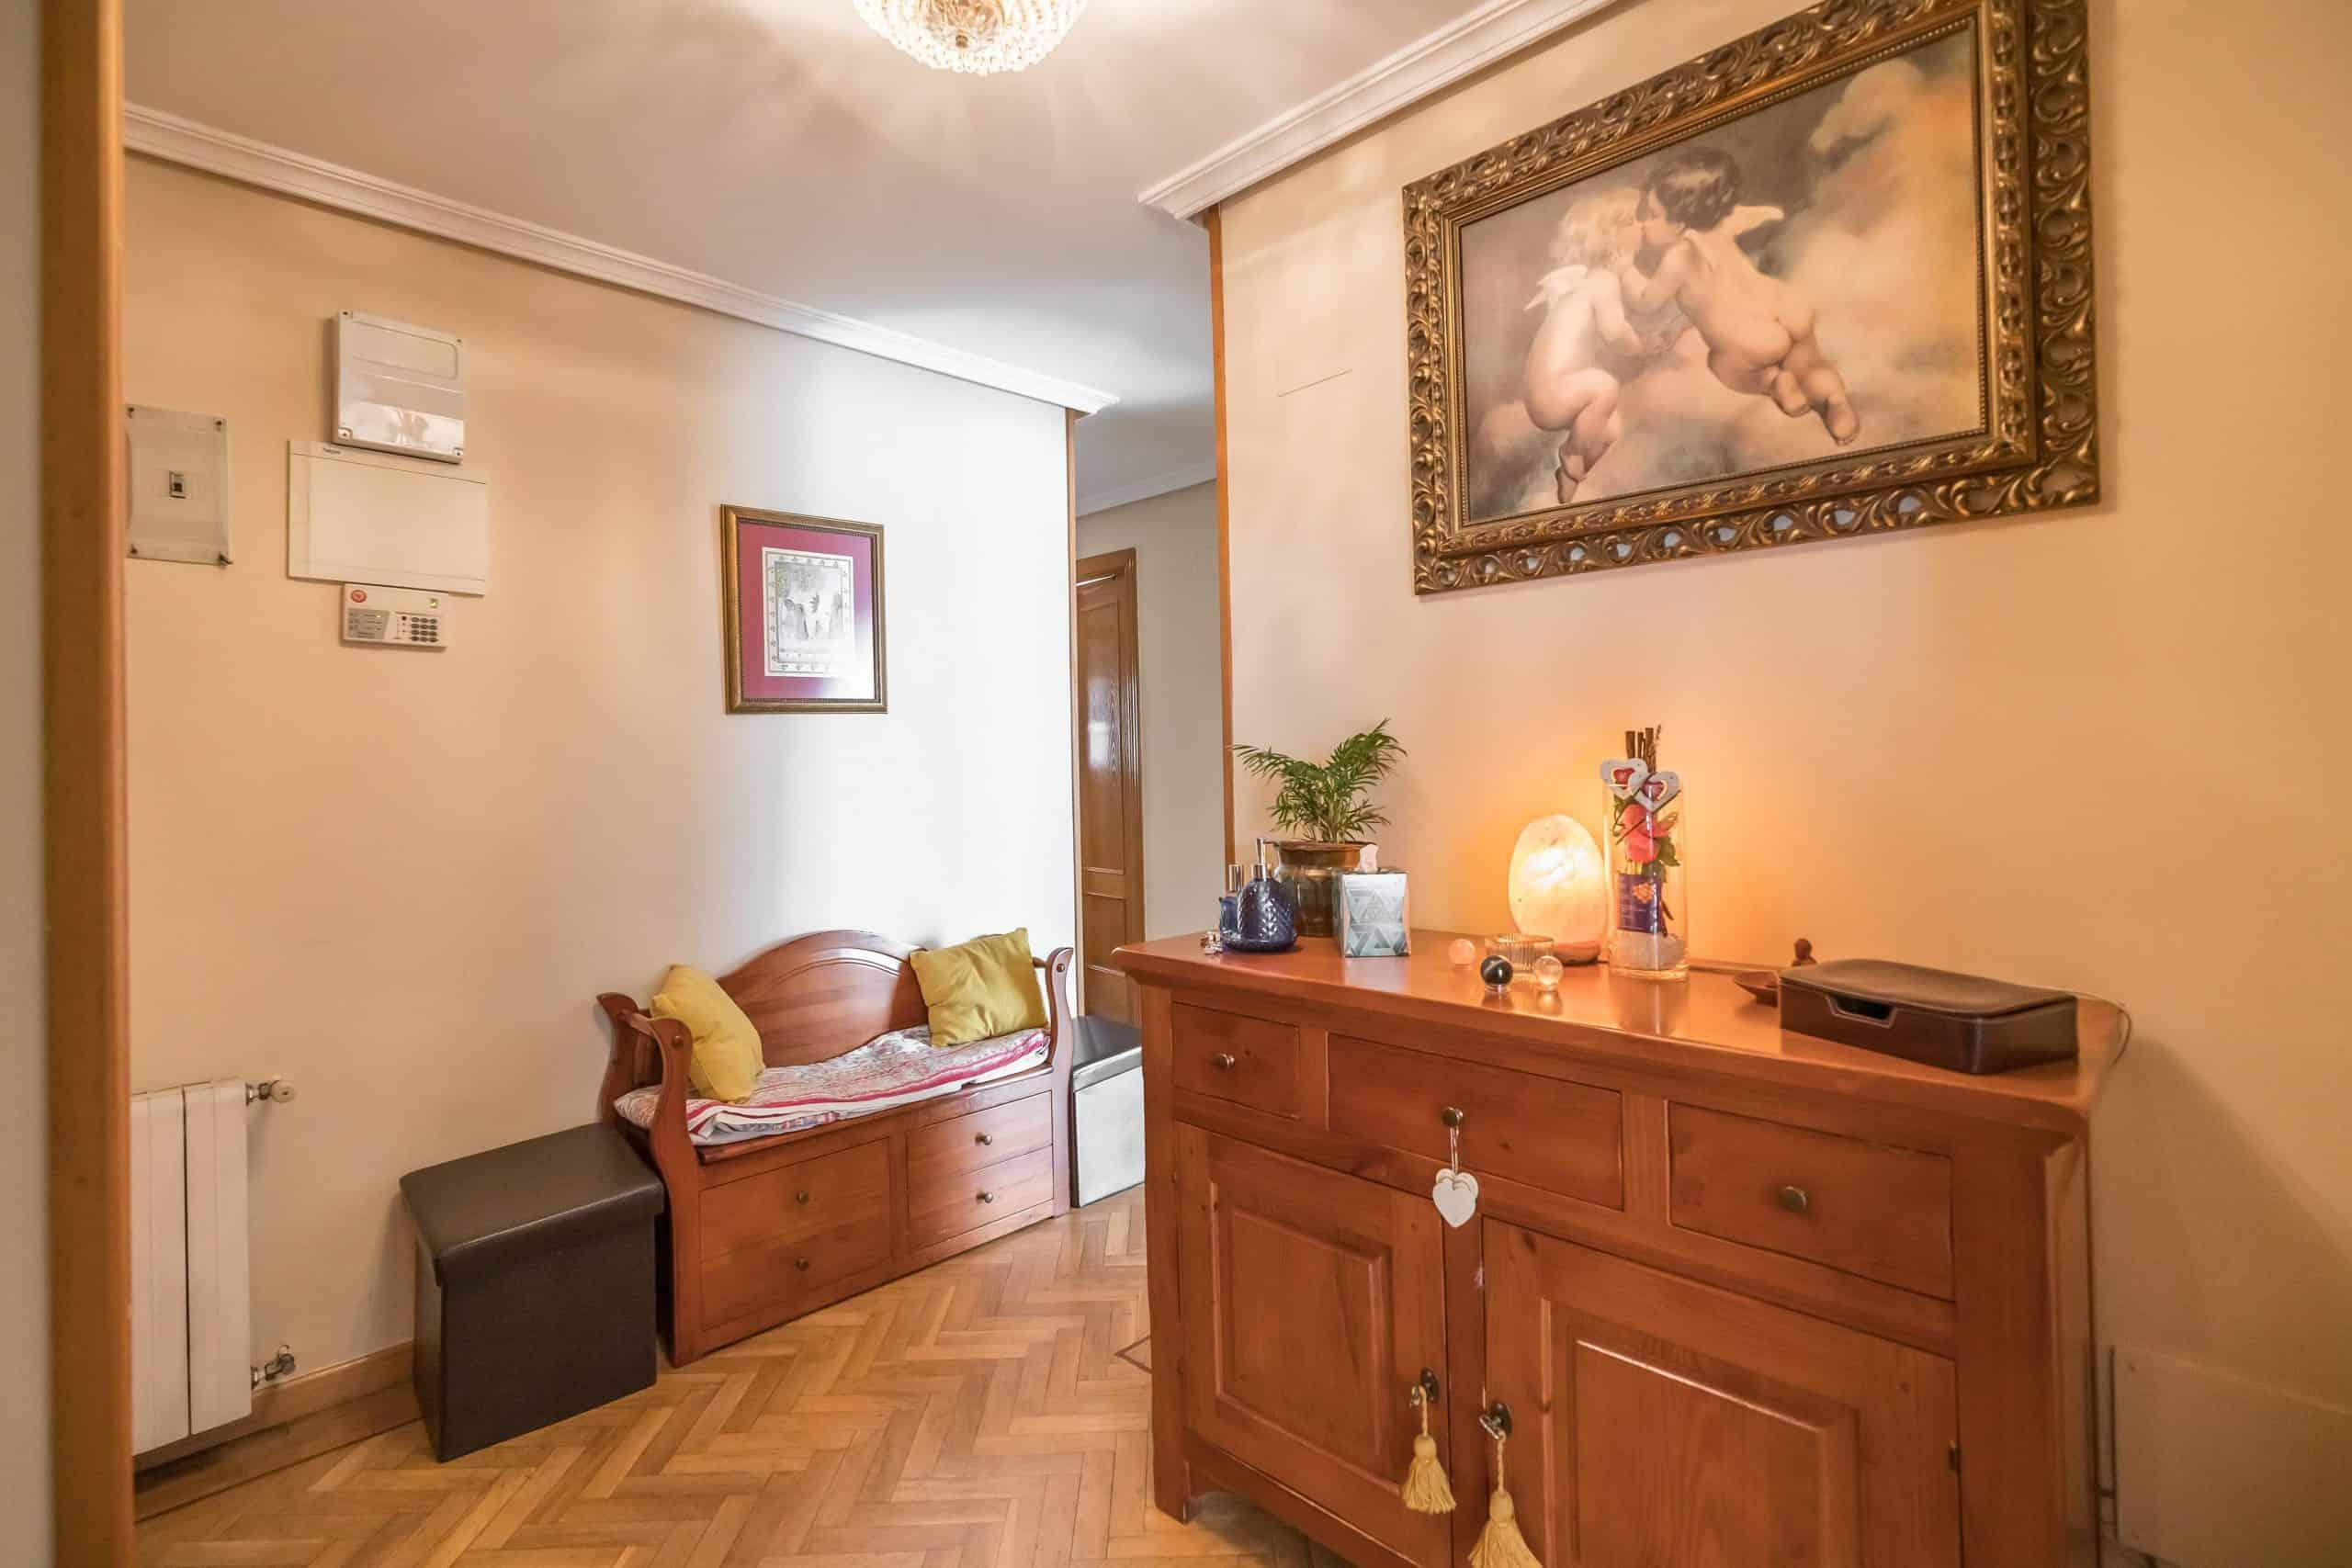 Agencia Inmobiliaria de Madrid-FUTUROCASA-Zona ARGANZUELA-EMBAJADORES-LEGAZPI1 ENTRADA PASILLO(1)